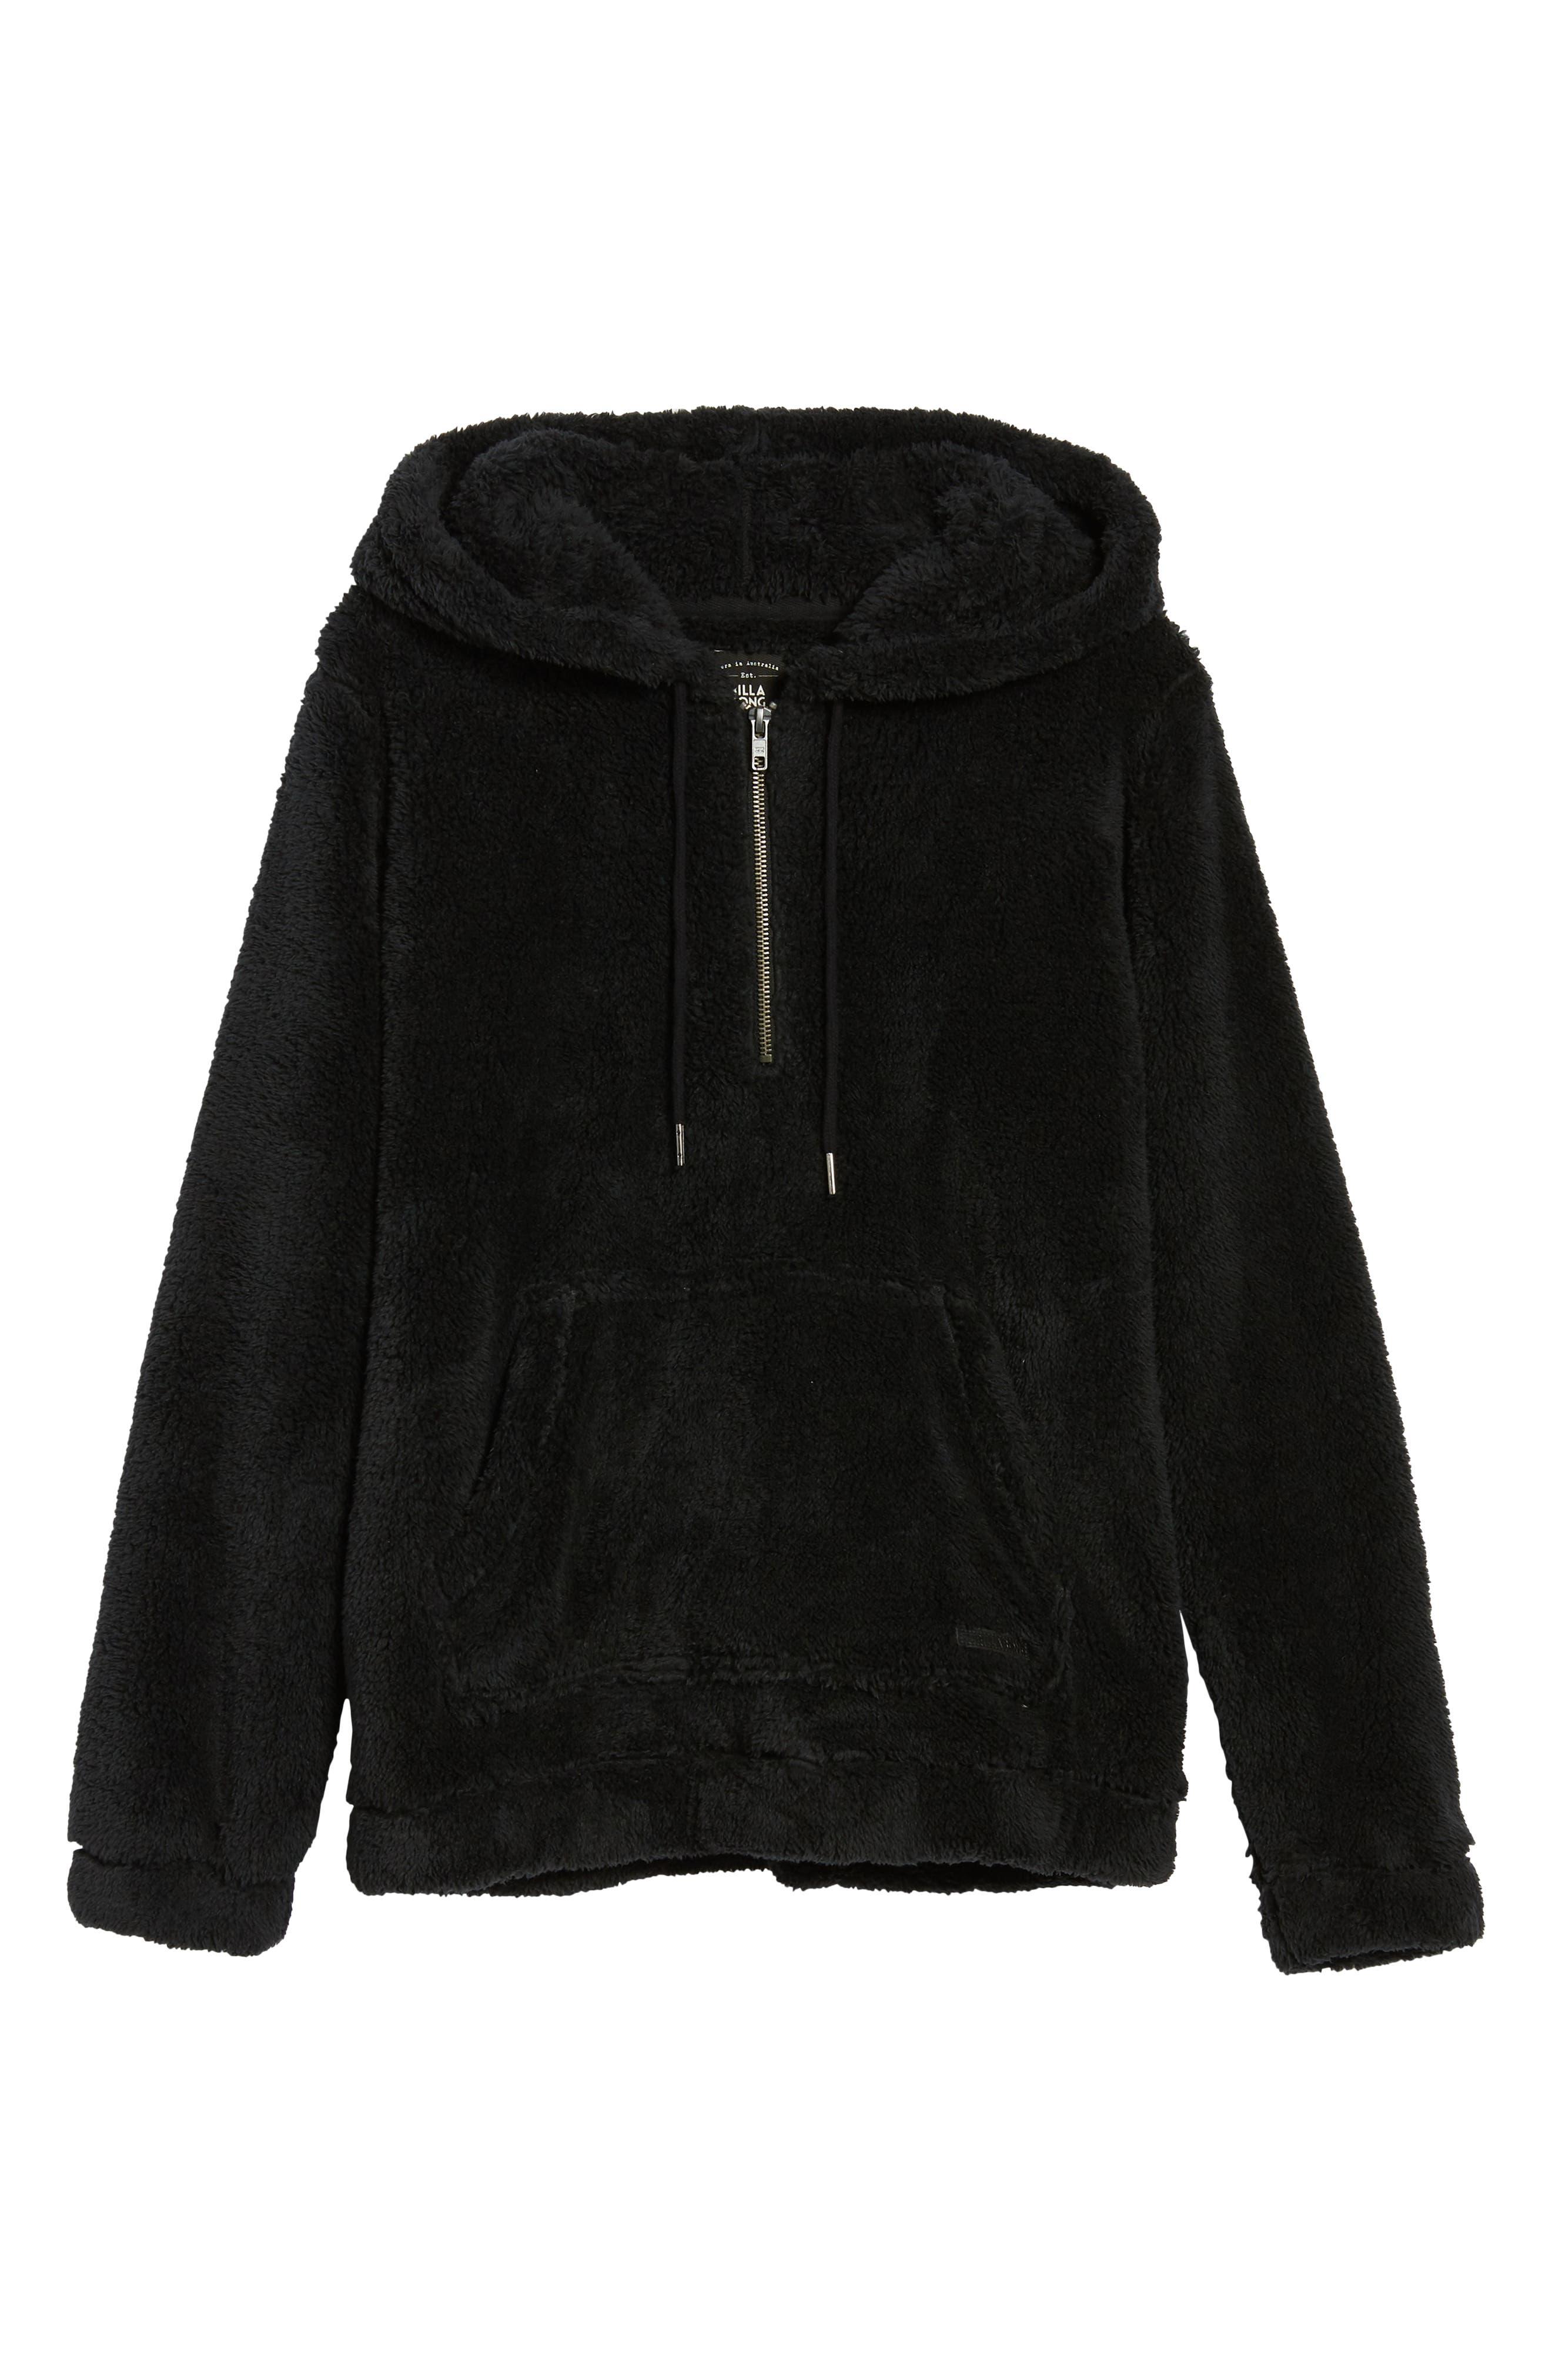 BILLABONG, Cozy For Keeps Fleece Pullover, Alternate thumbnail 7, color, 001